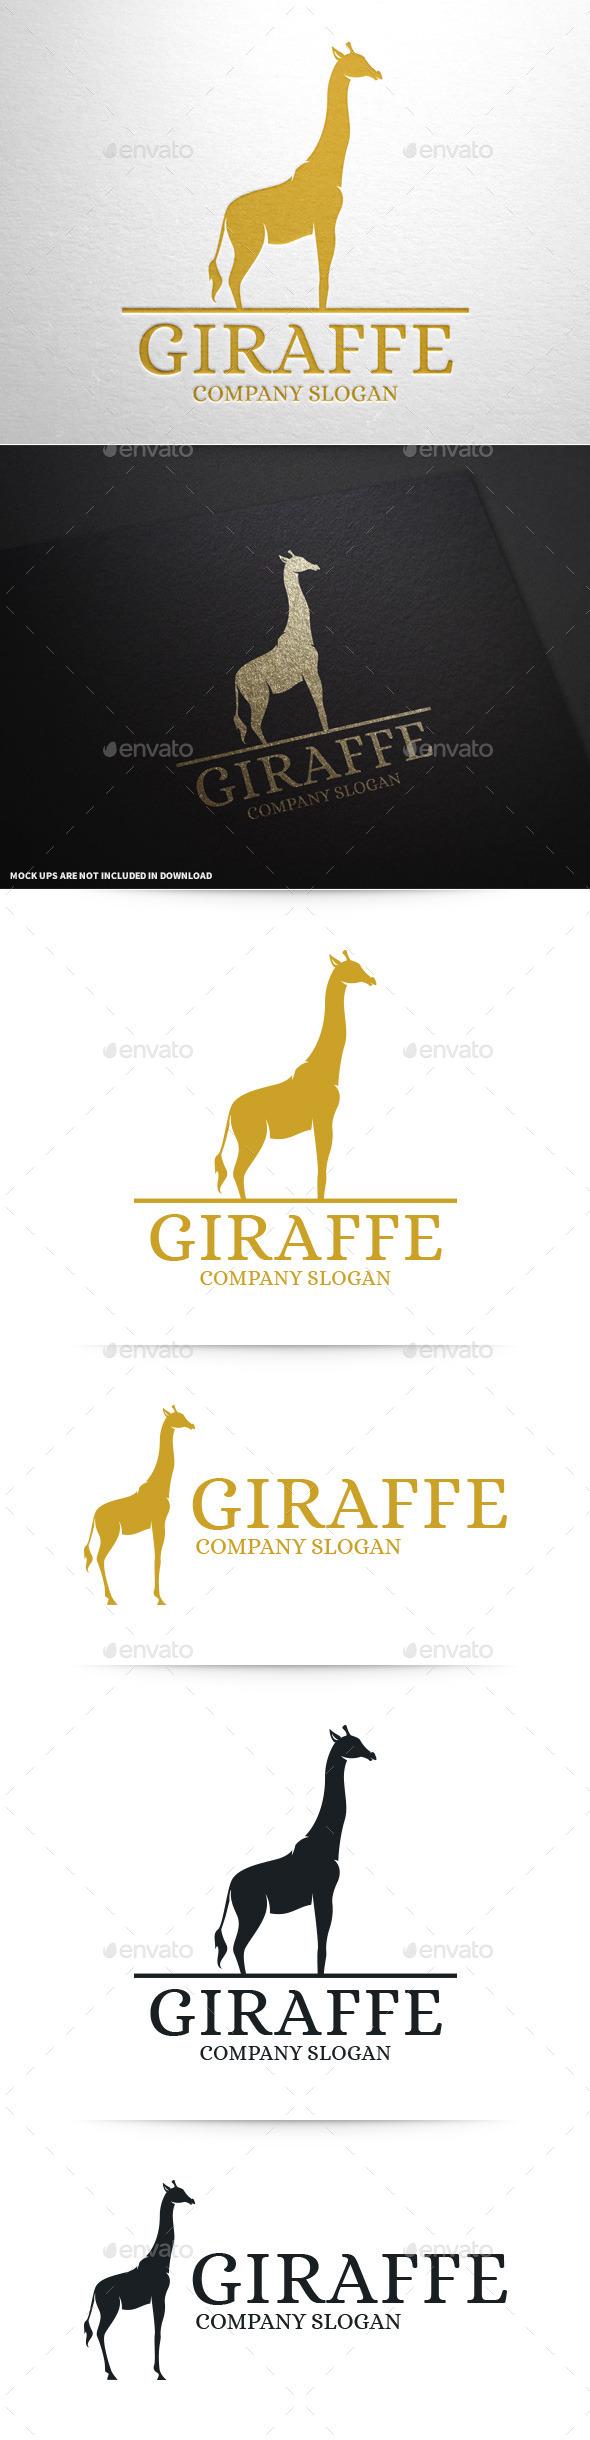 GraphicRiver Giraffe Logo Template 10046047